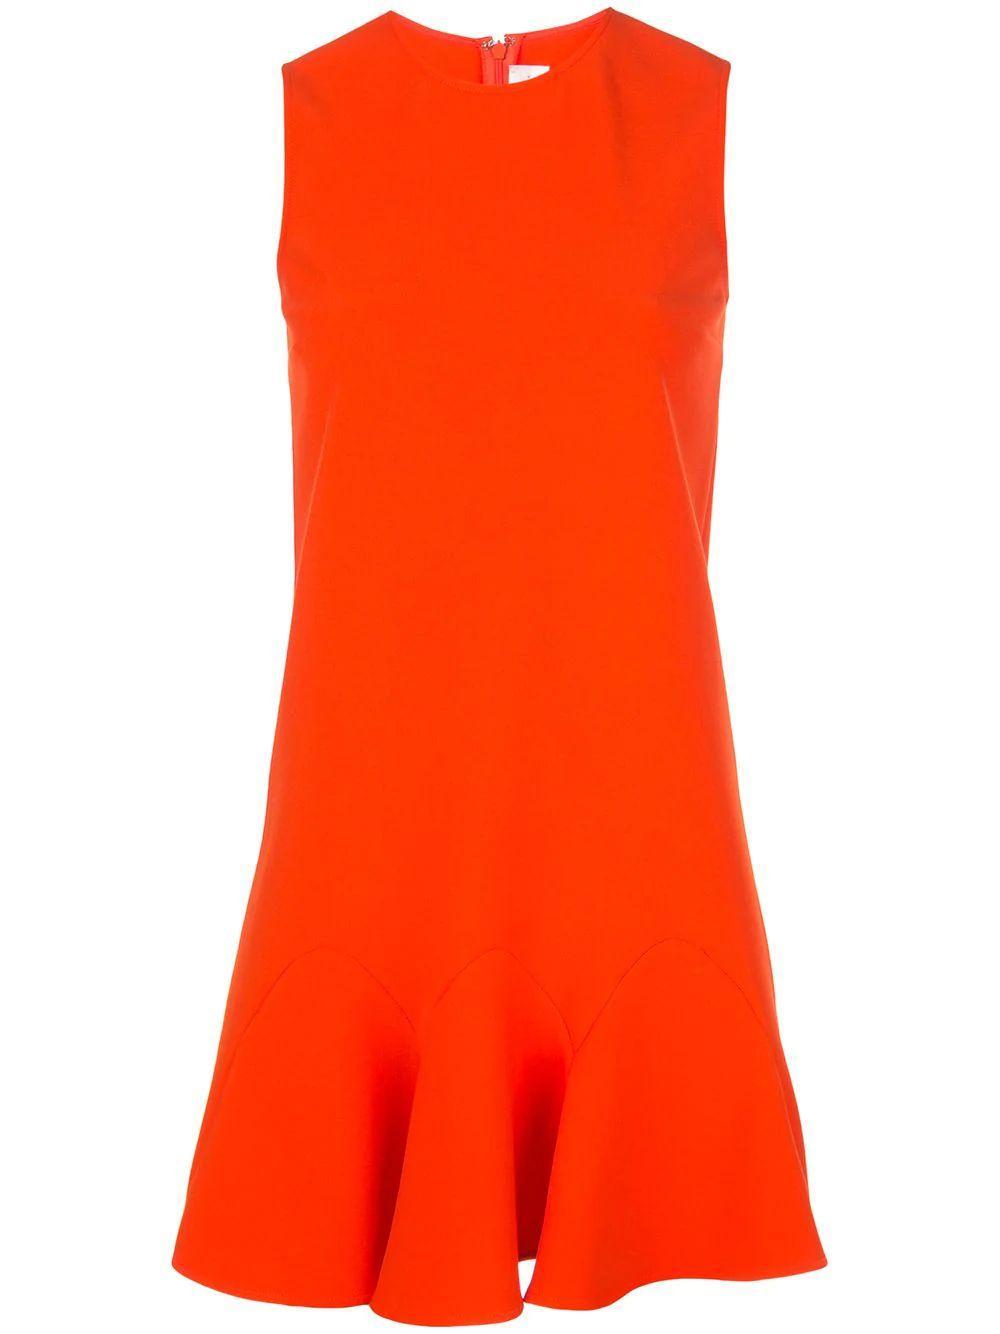 Sleeve Less Flounce Hem Shift Dress Item # 2120WDR000897A